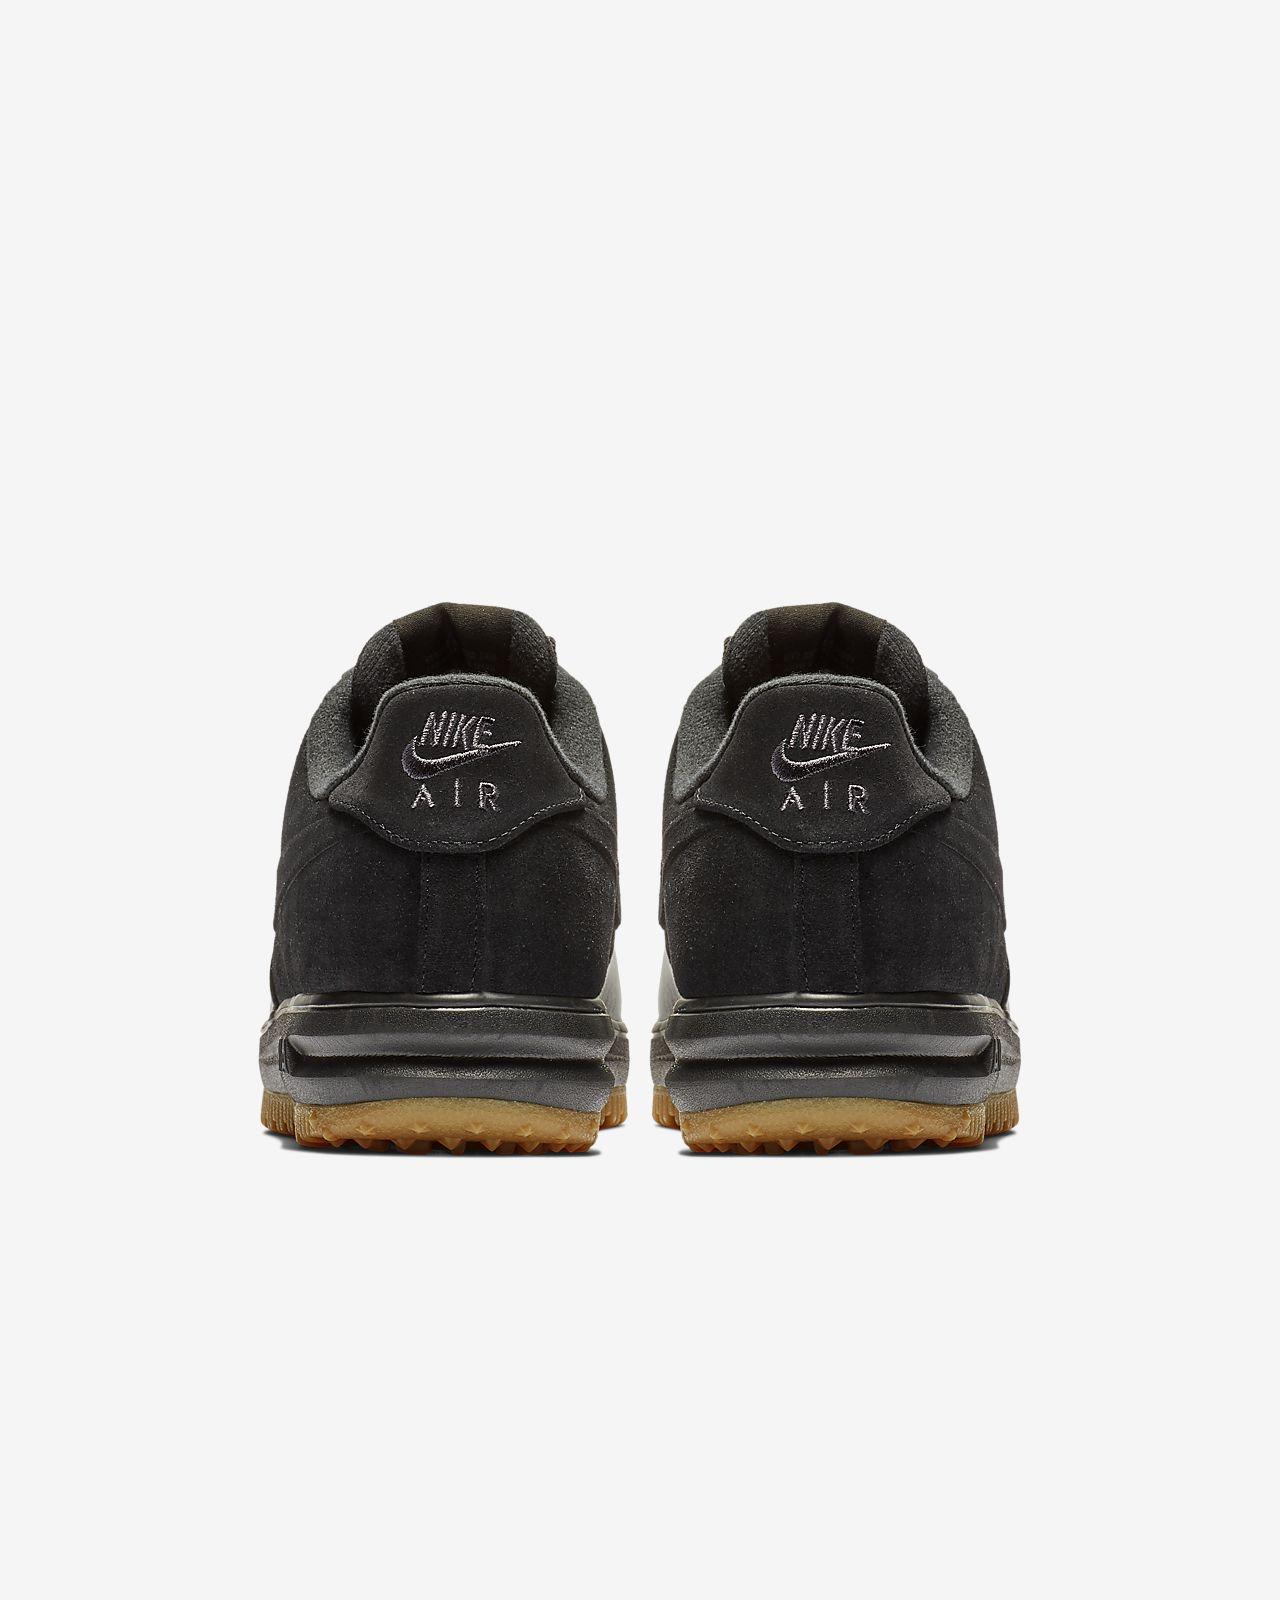 sports shoes fd9bb 16a58 ... Calzado para hombre Nike Lunar Force 1 Duckboot Low